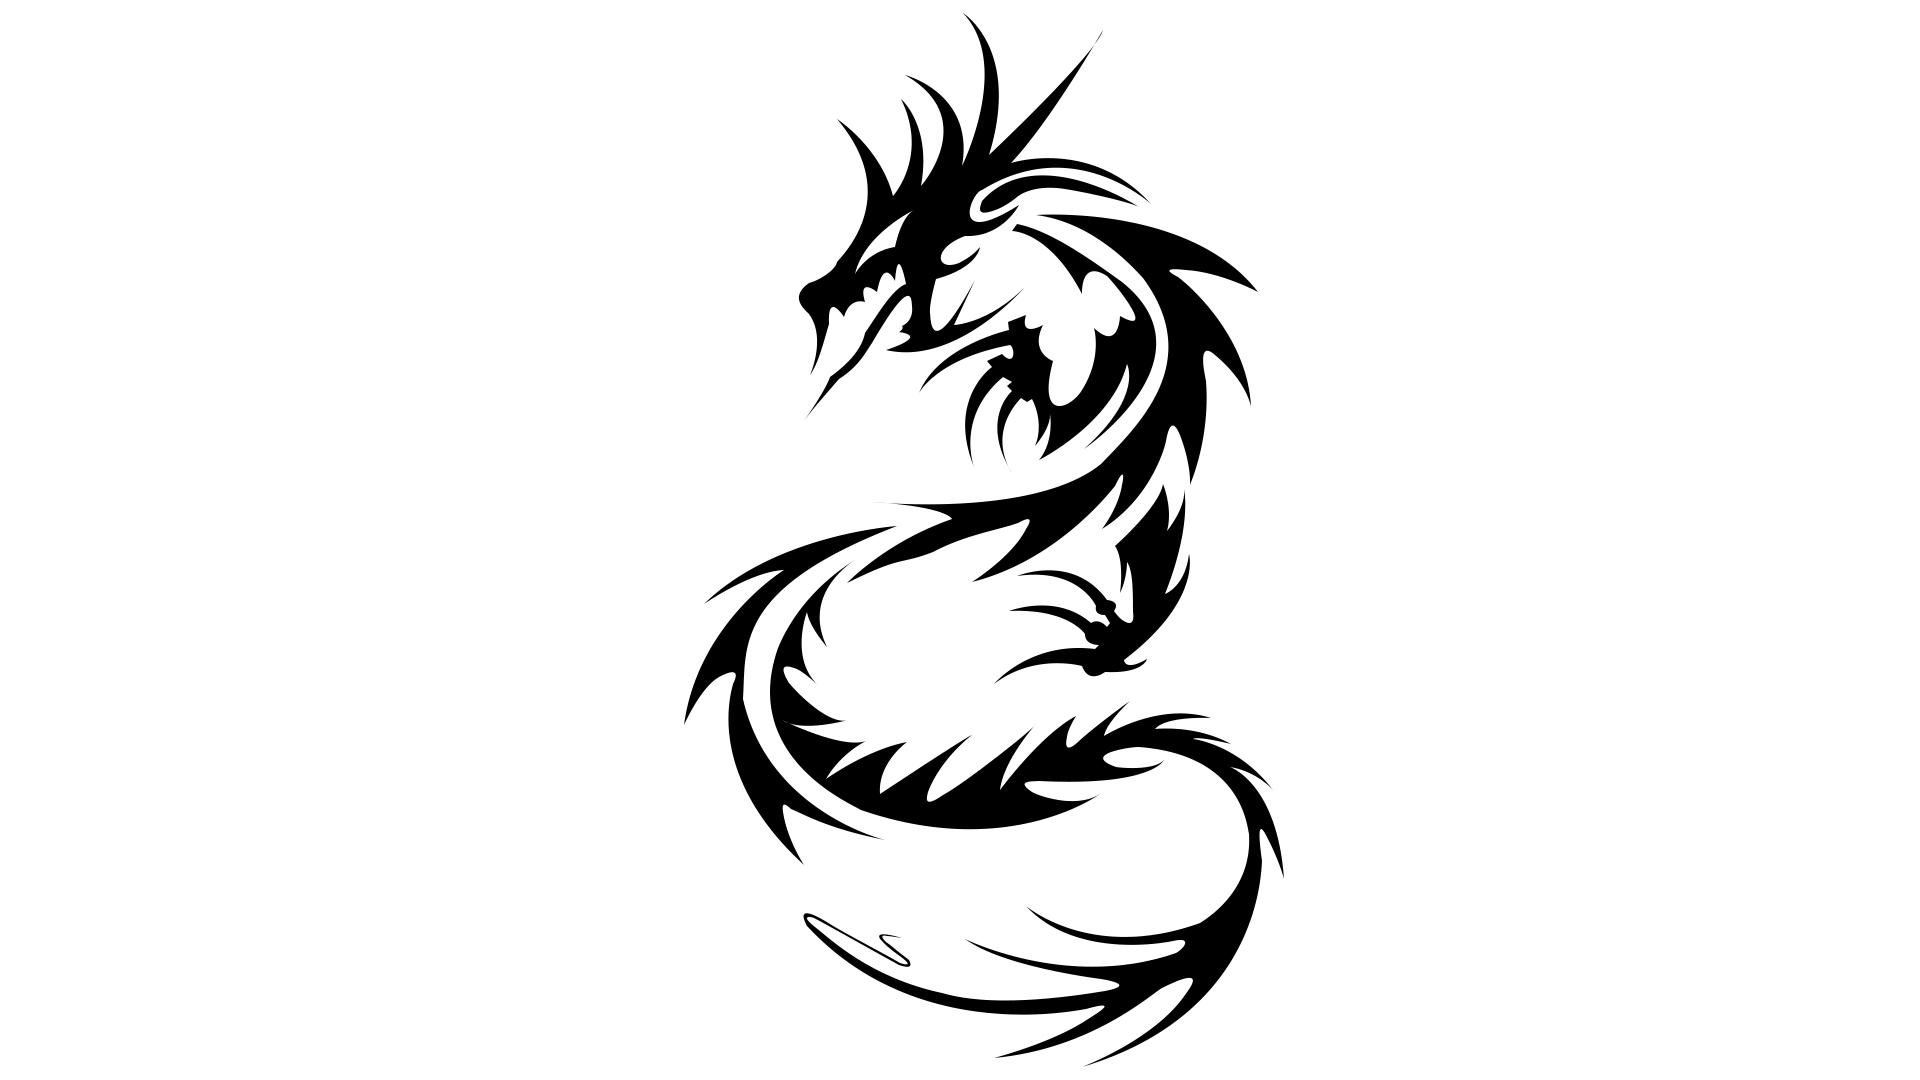 Photoshop clipart dragon Art Graphics Clip Blog Tattoo